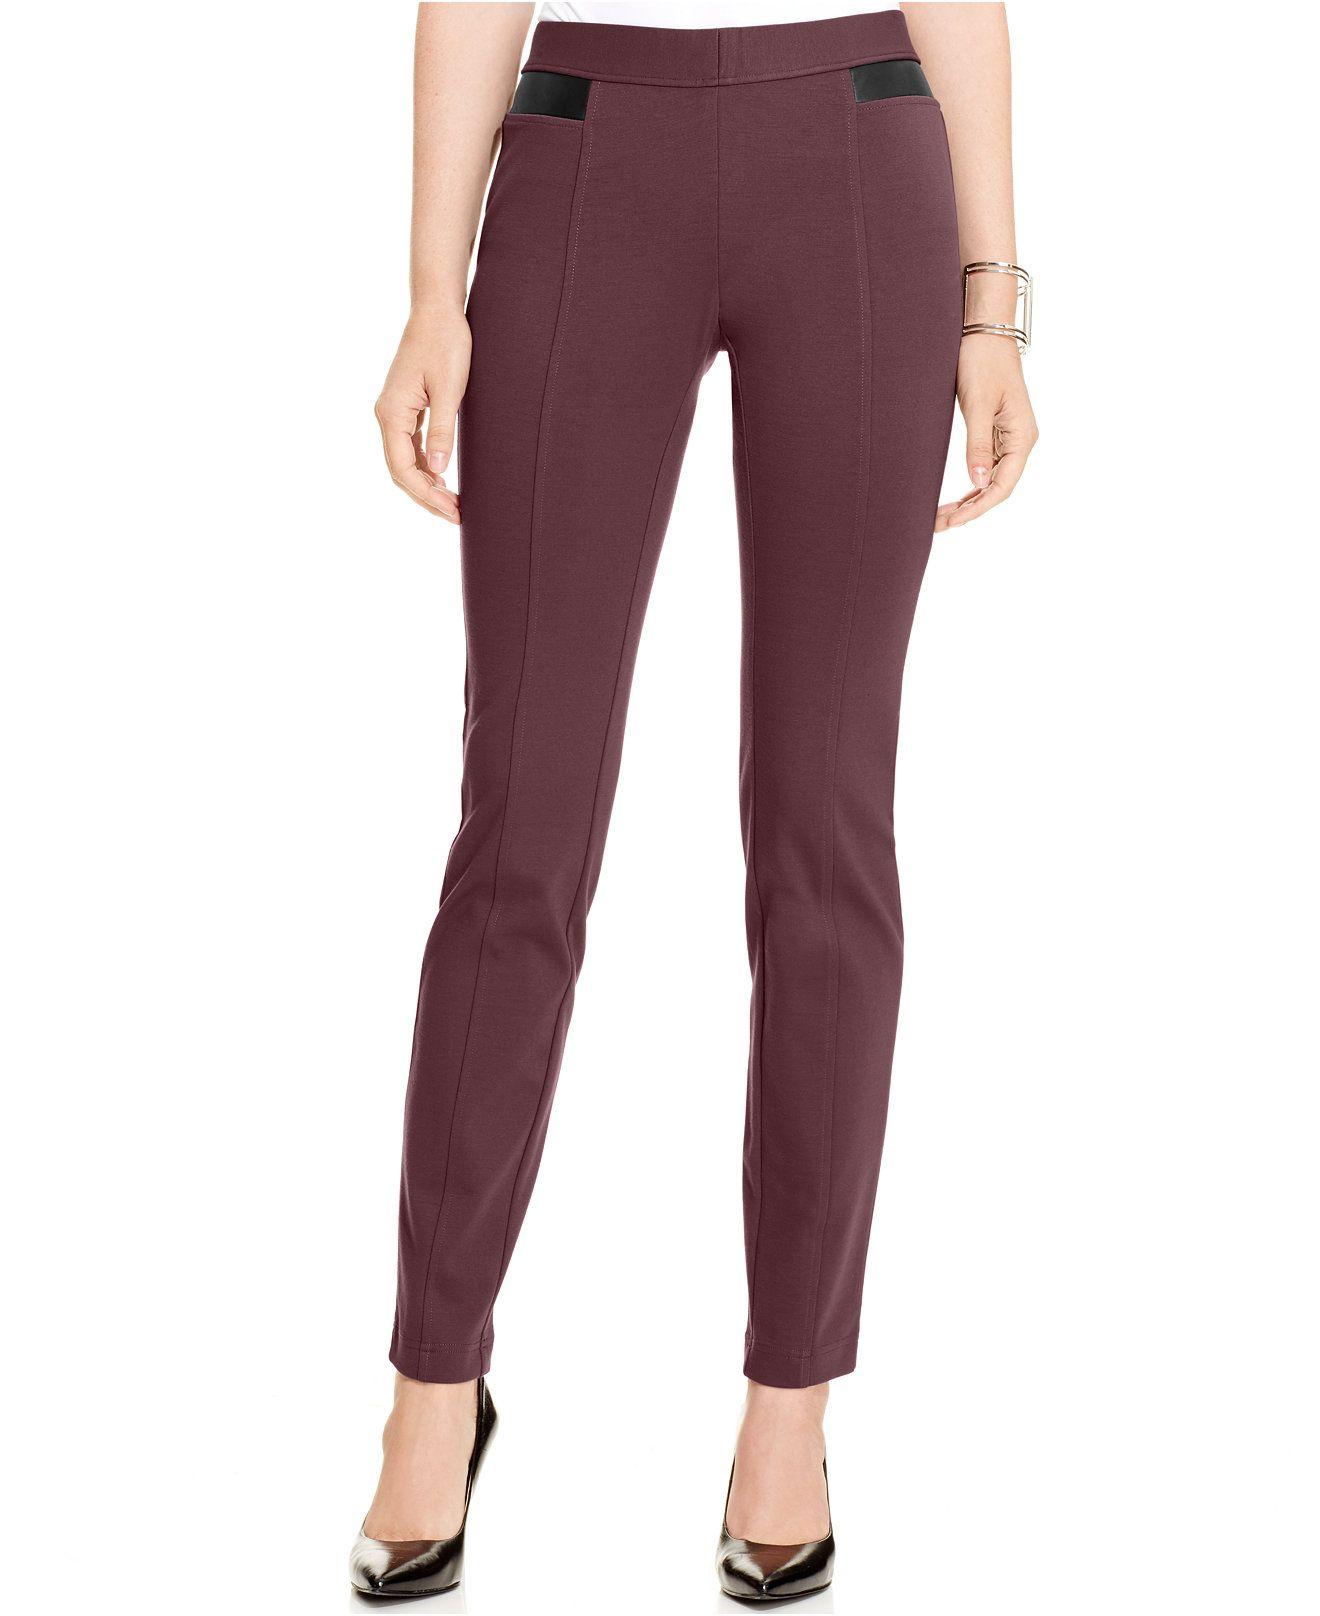 bfe985c259 Pantalones Alfani Faux-piel-Trim panza-Control